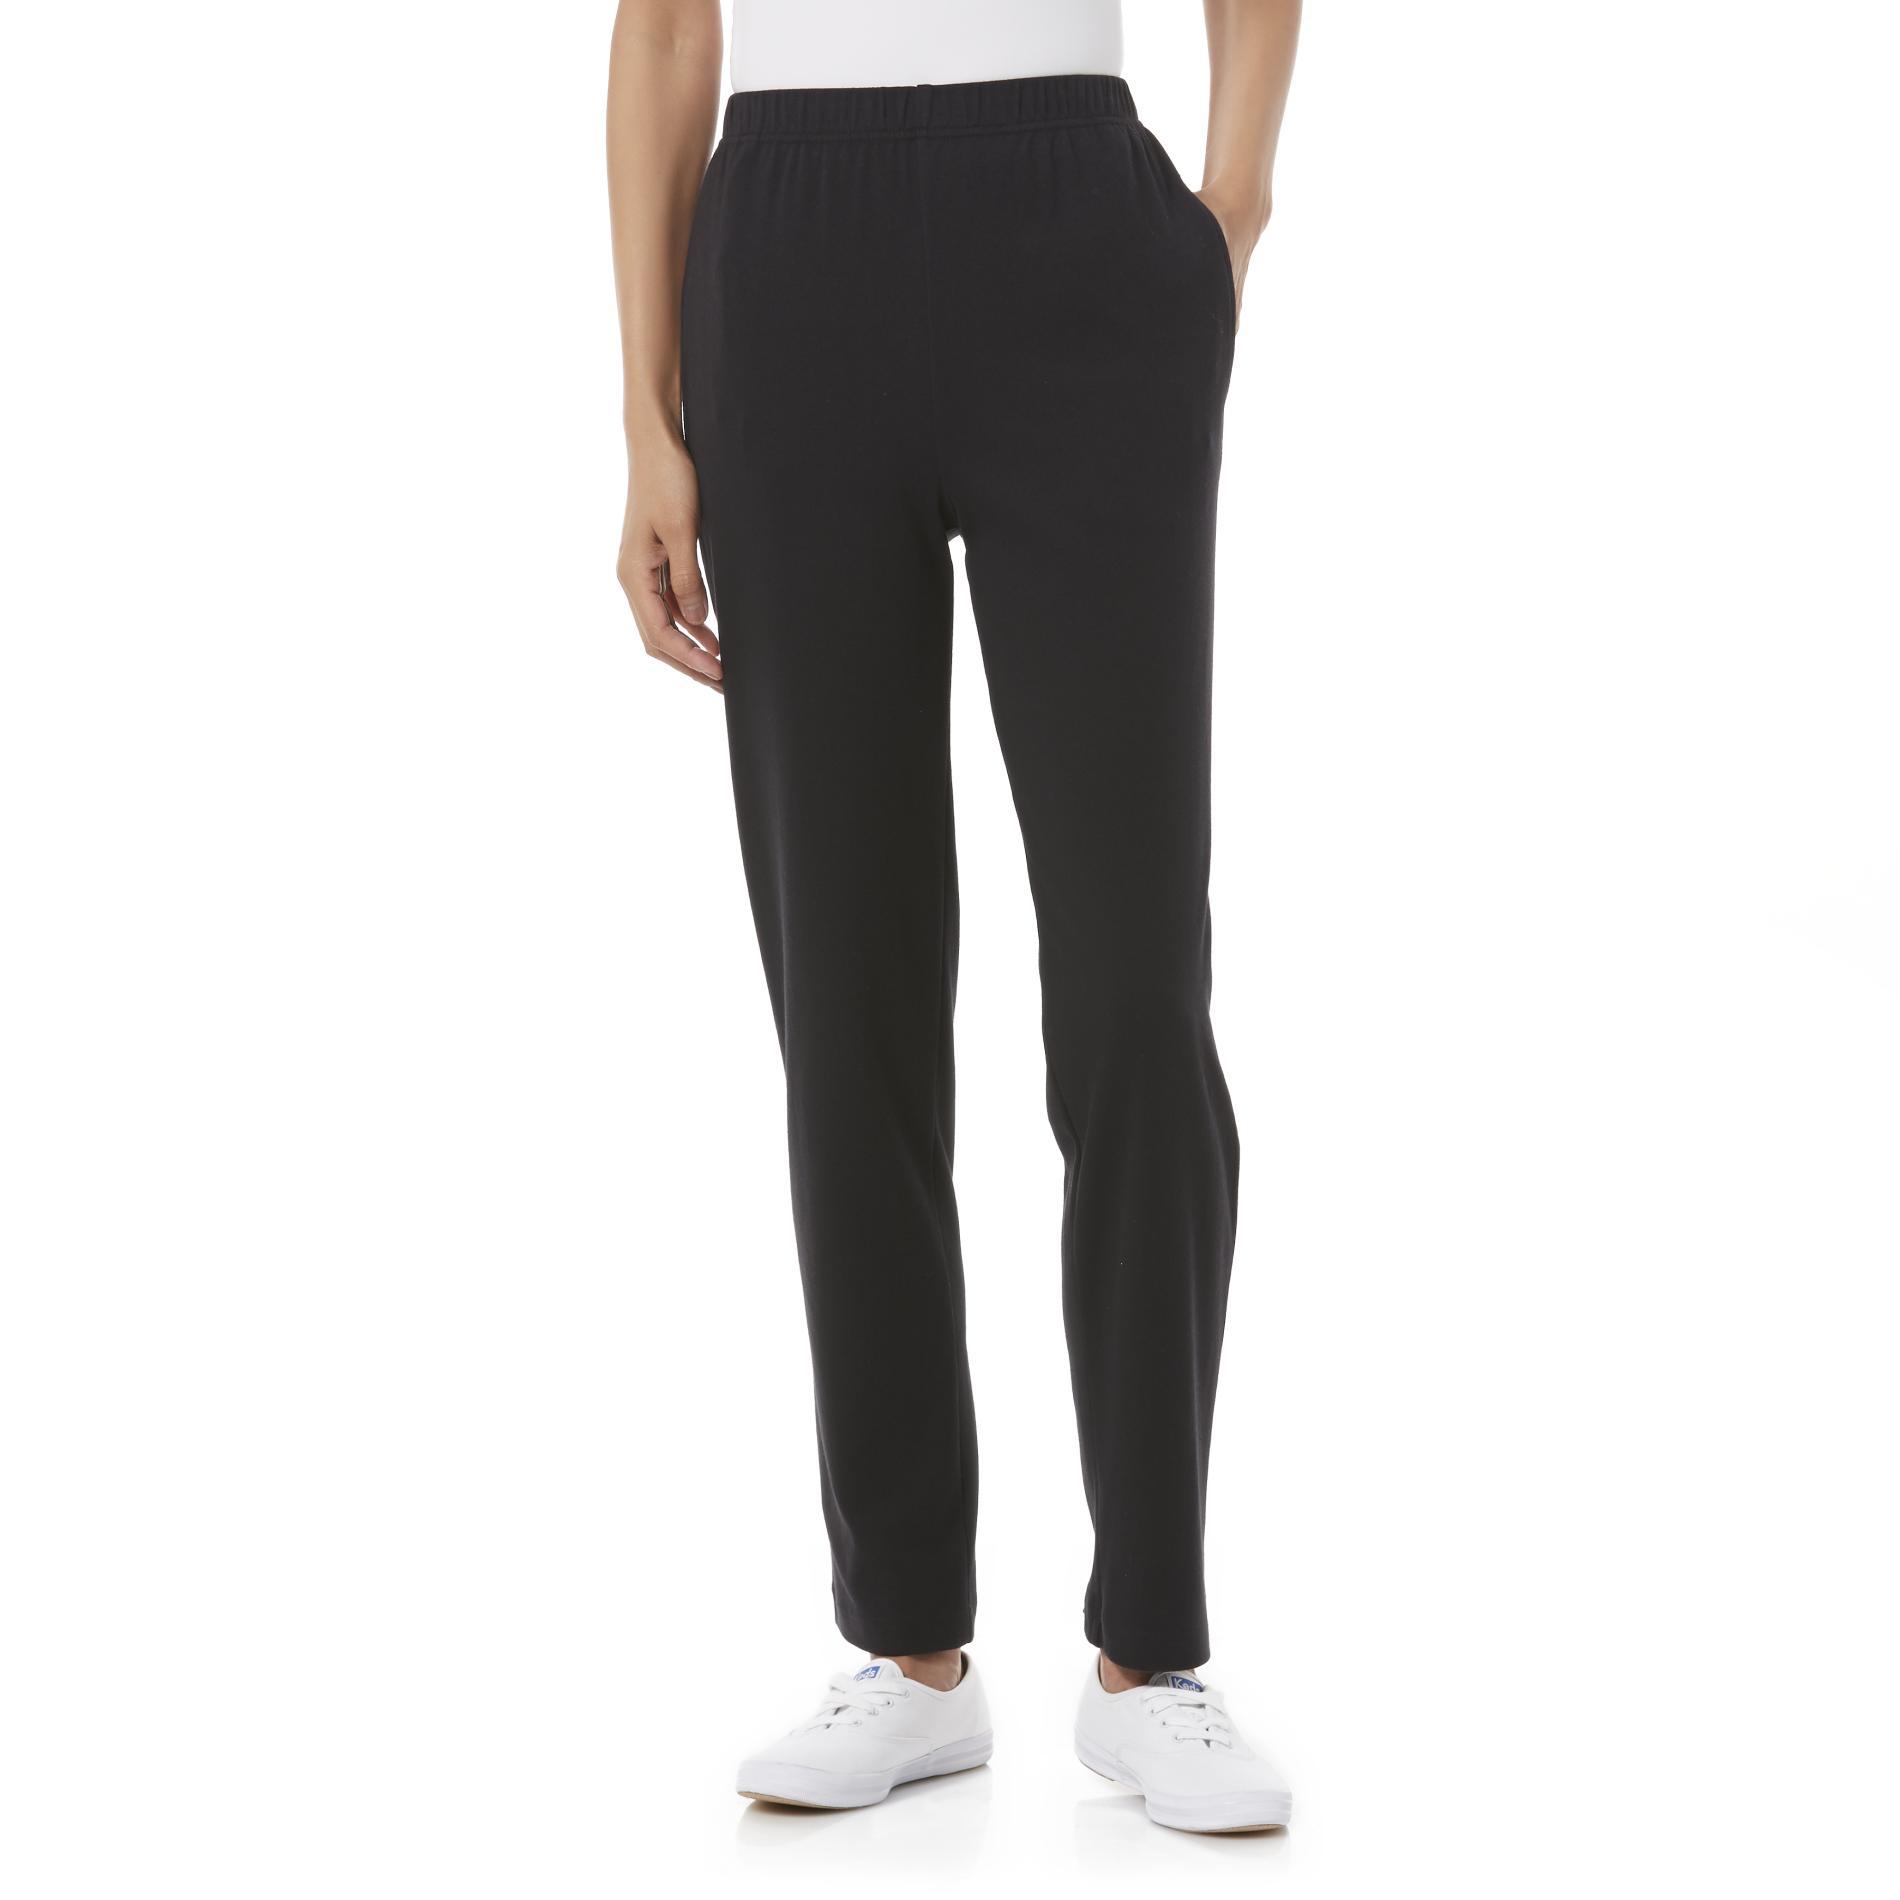 Basic Editions Women' Knit Pants - Clothing